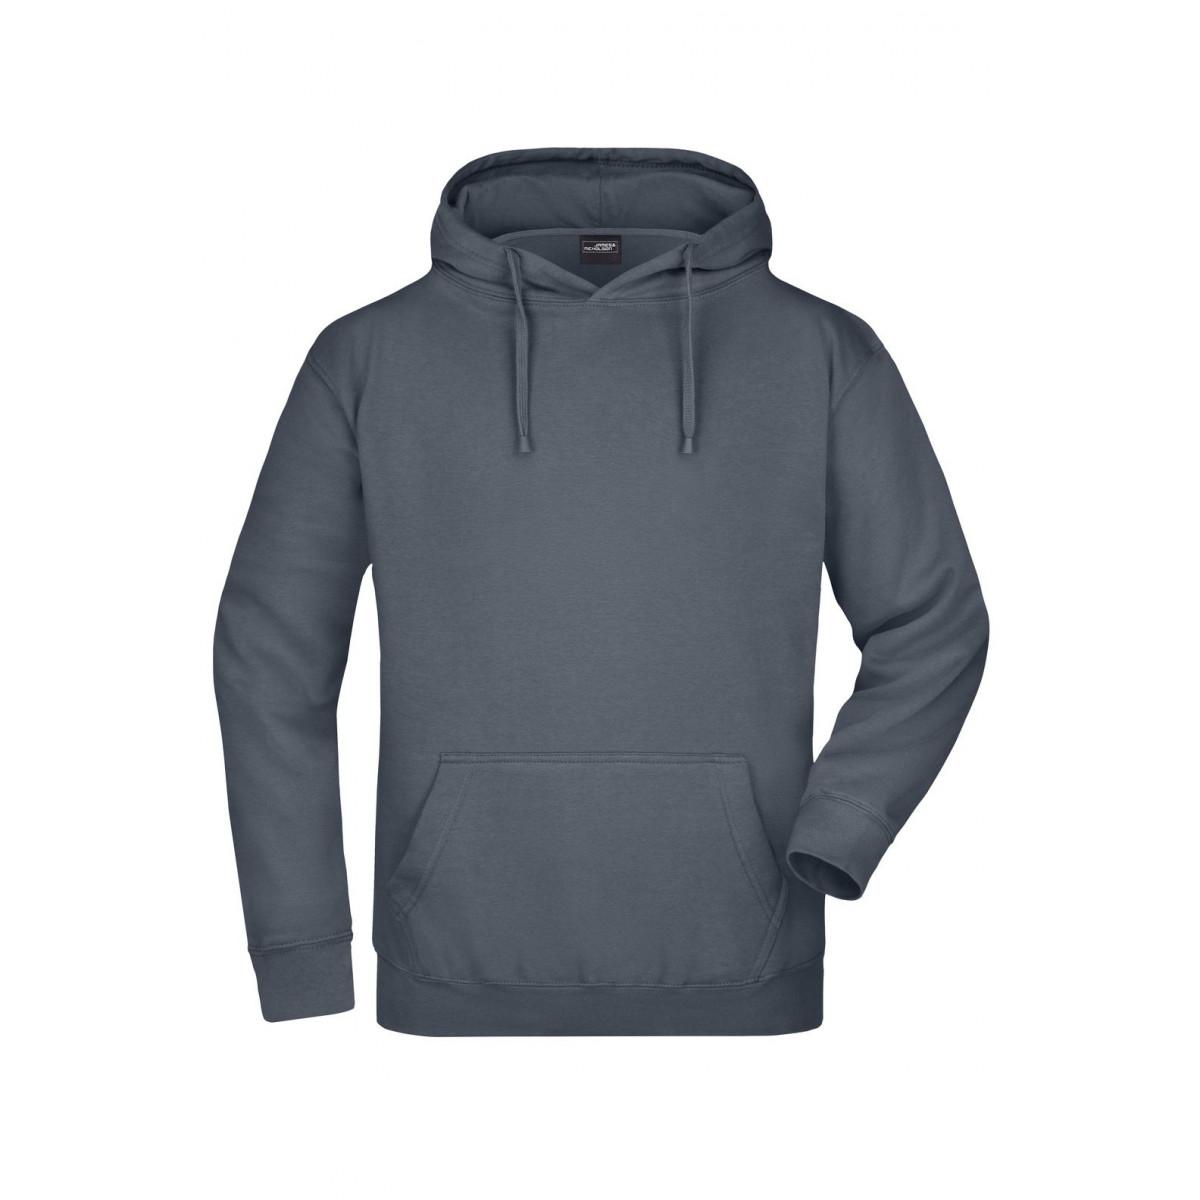 Толстовка мужская JN047 Hooded Sweat - Угольный